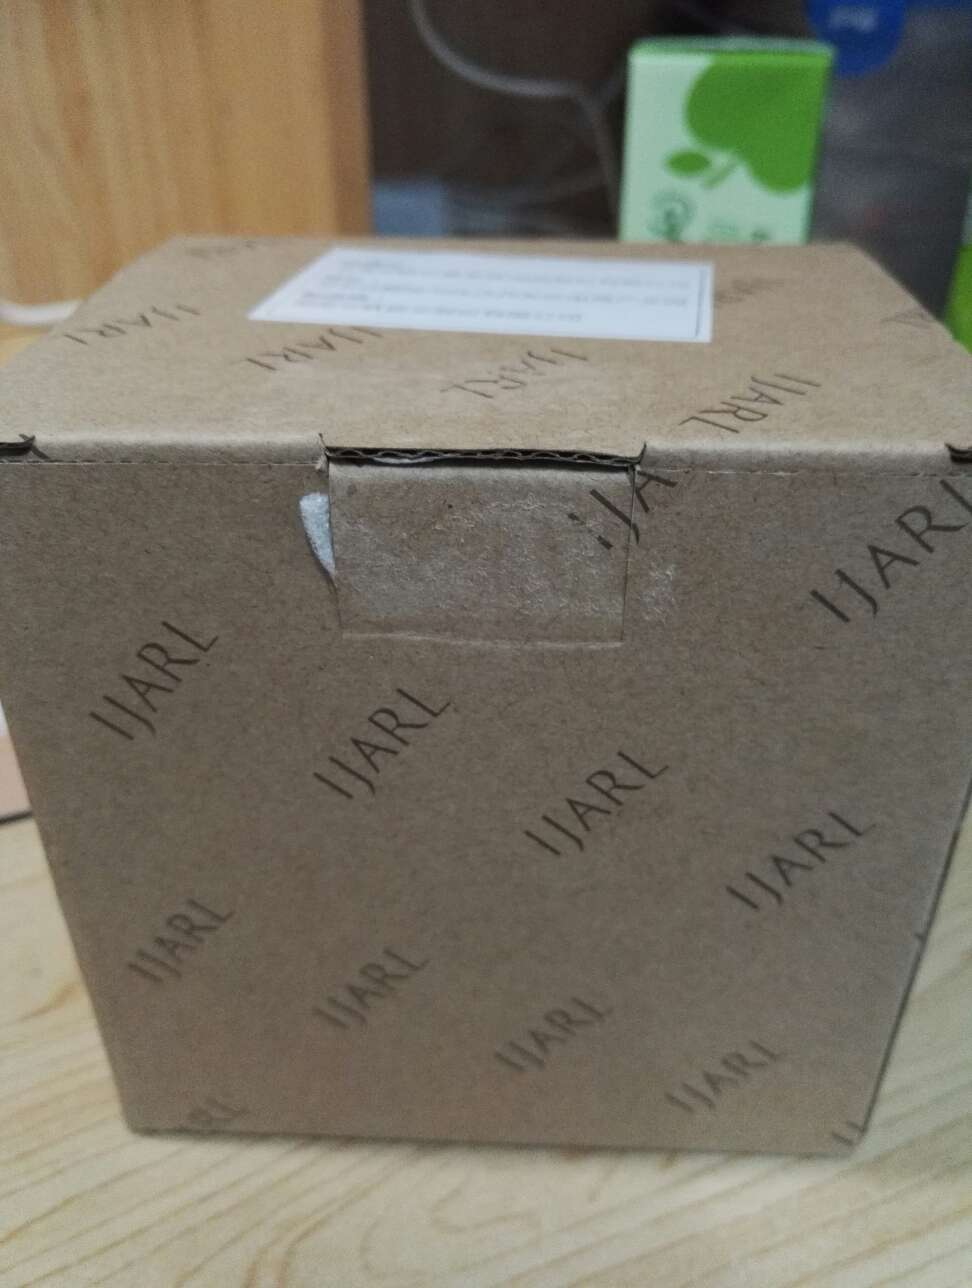 chrome hearts mens bags reviews 00288971 for-cheap